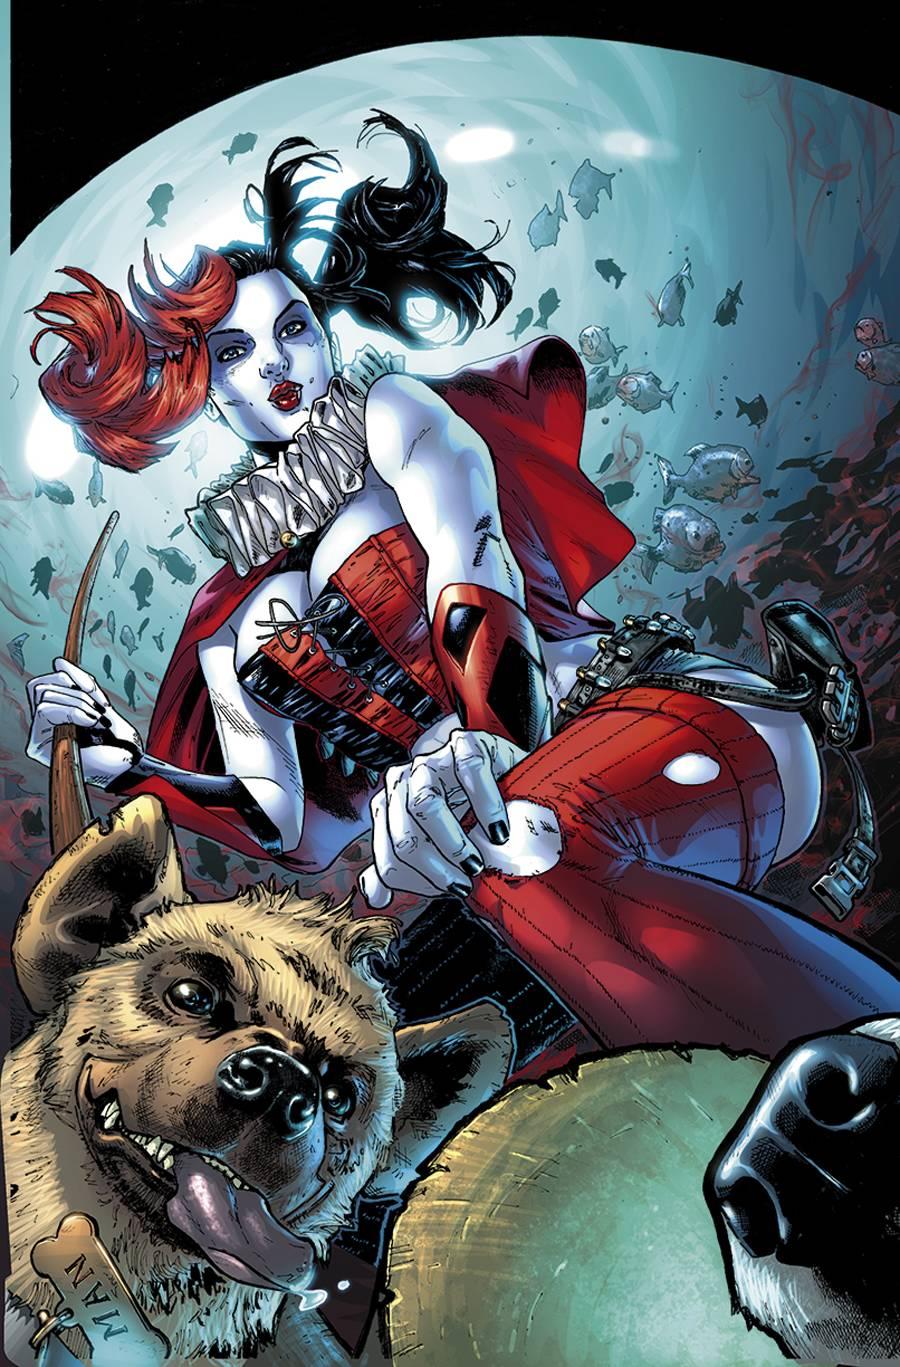 Harley Quinn Vol 2 1 2nd Printing Textless.jpg